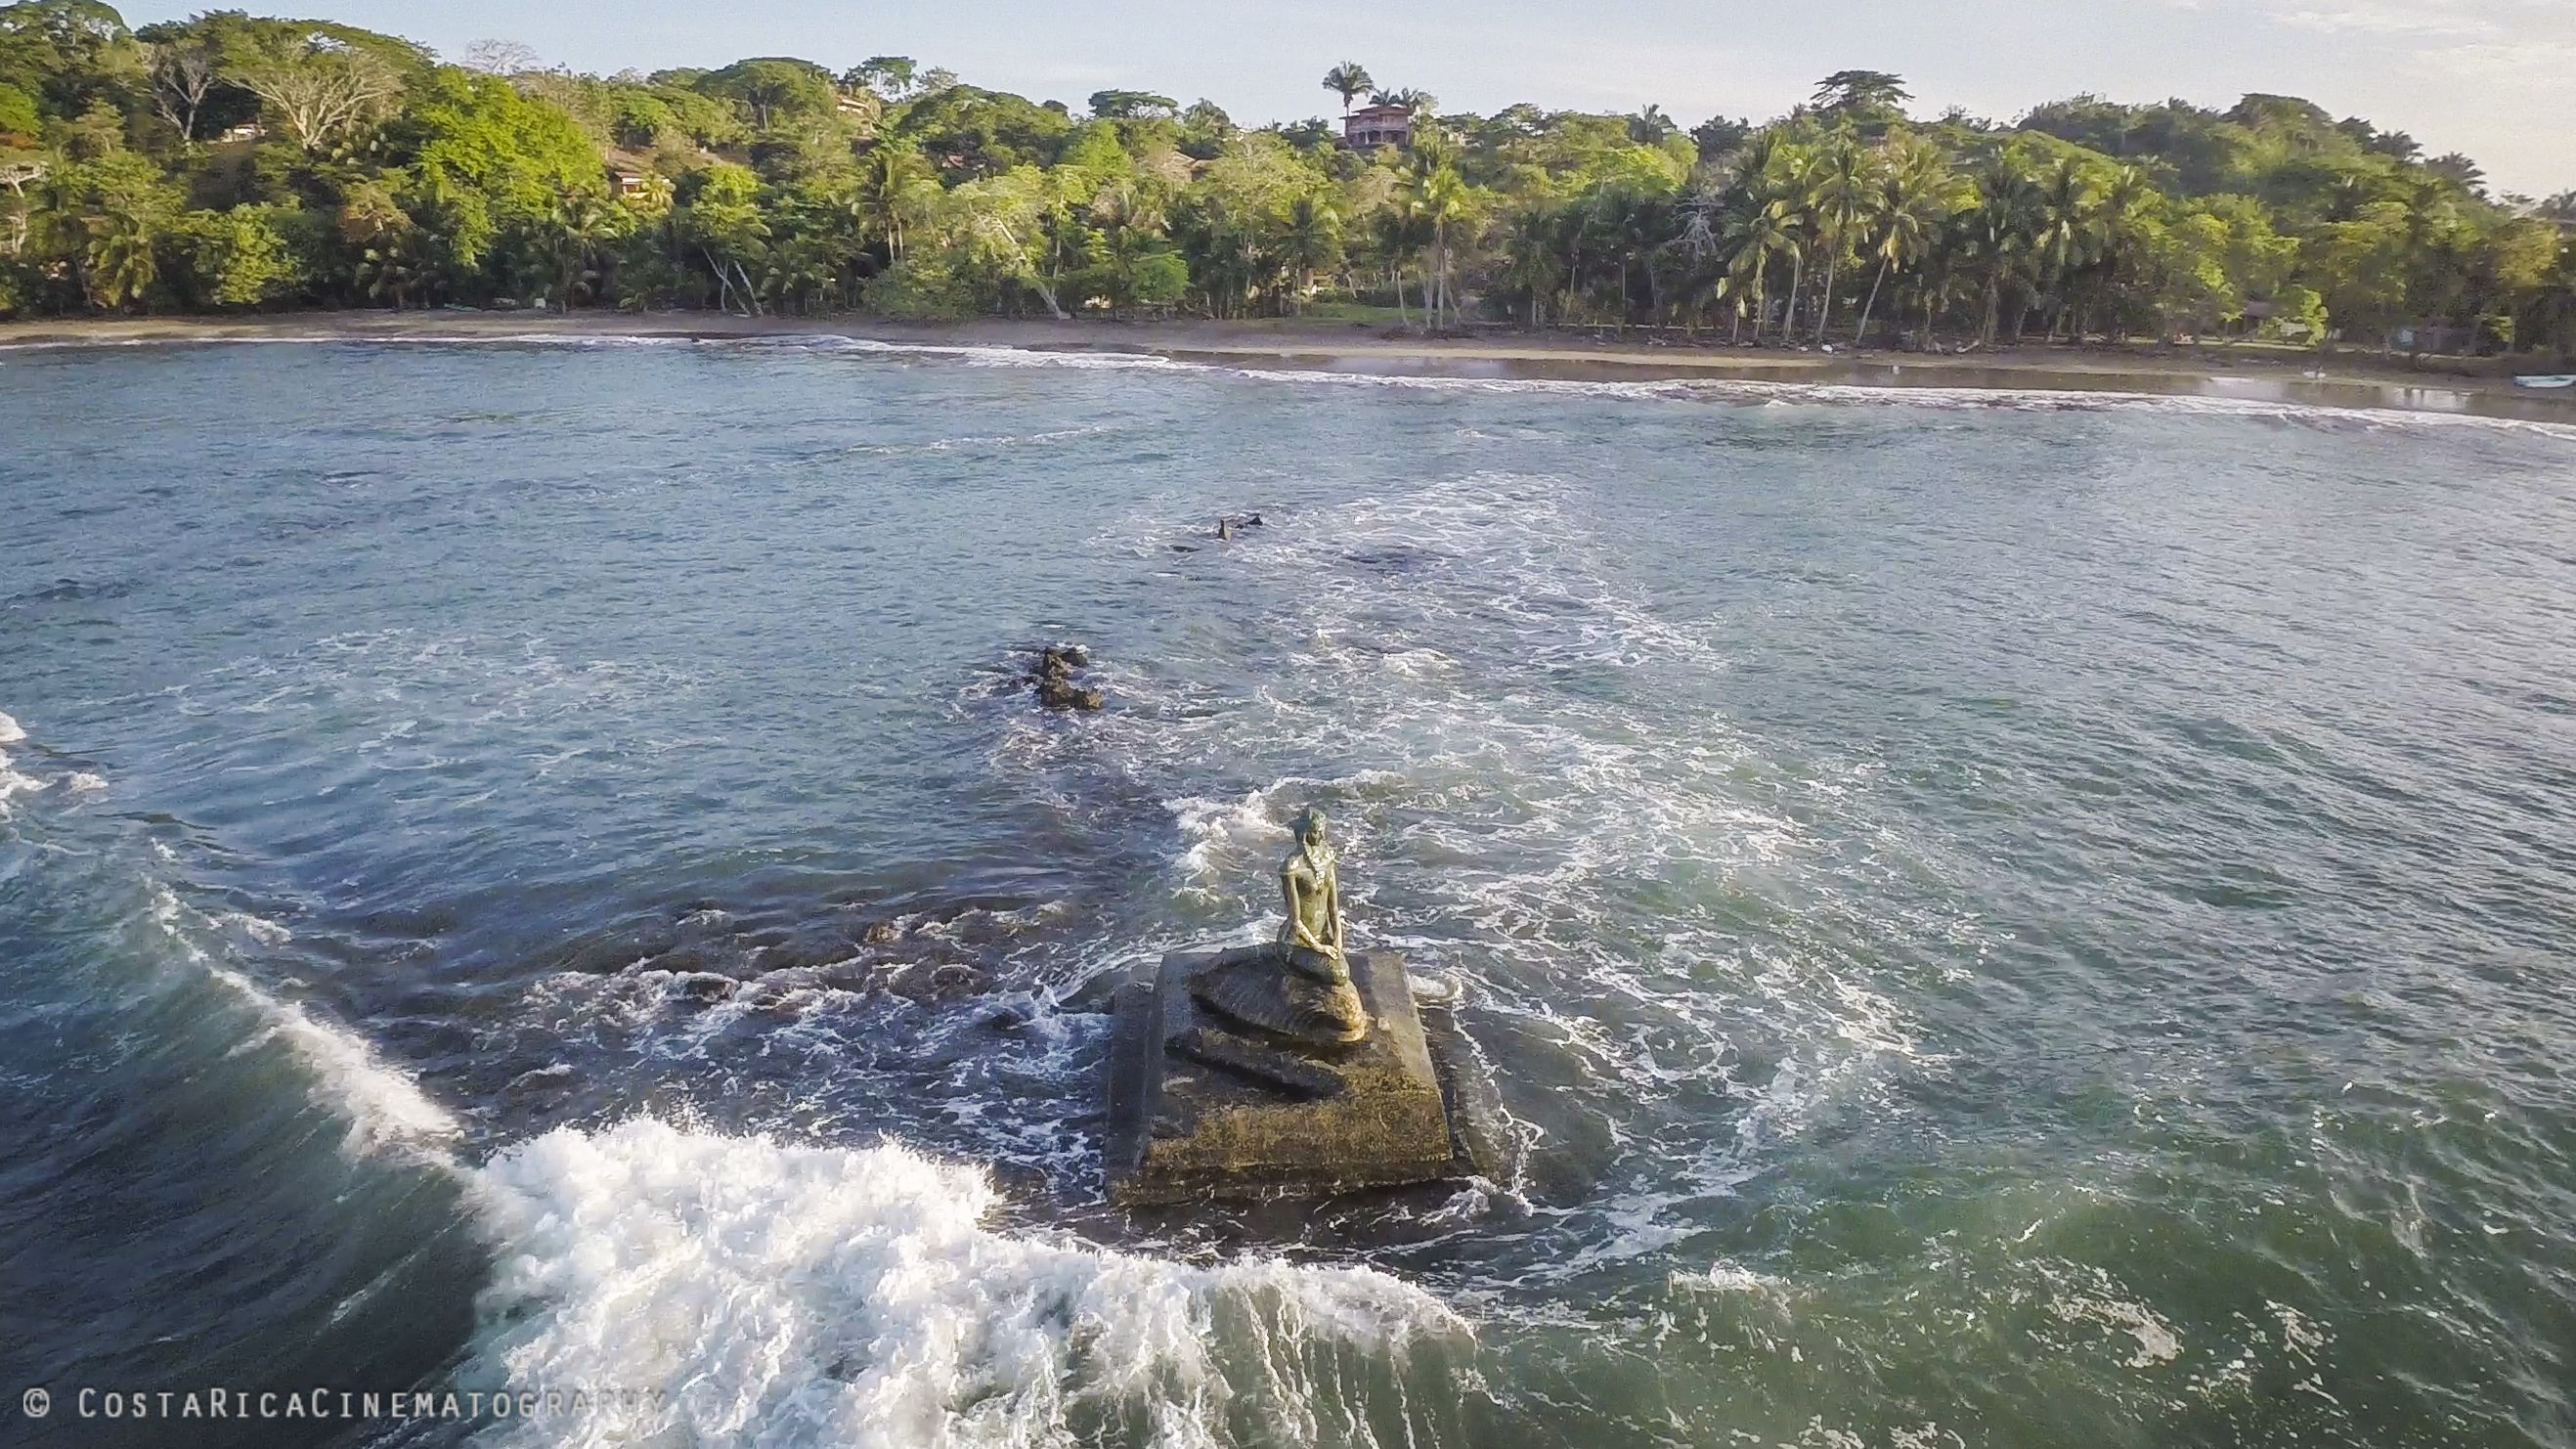 Hotel Rancho Coral (Costa Rica/Esterillos Oeste) - Reviews, Photos & Price  Comparison - TripAdvisor